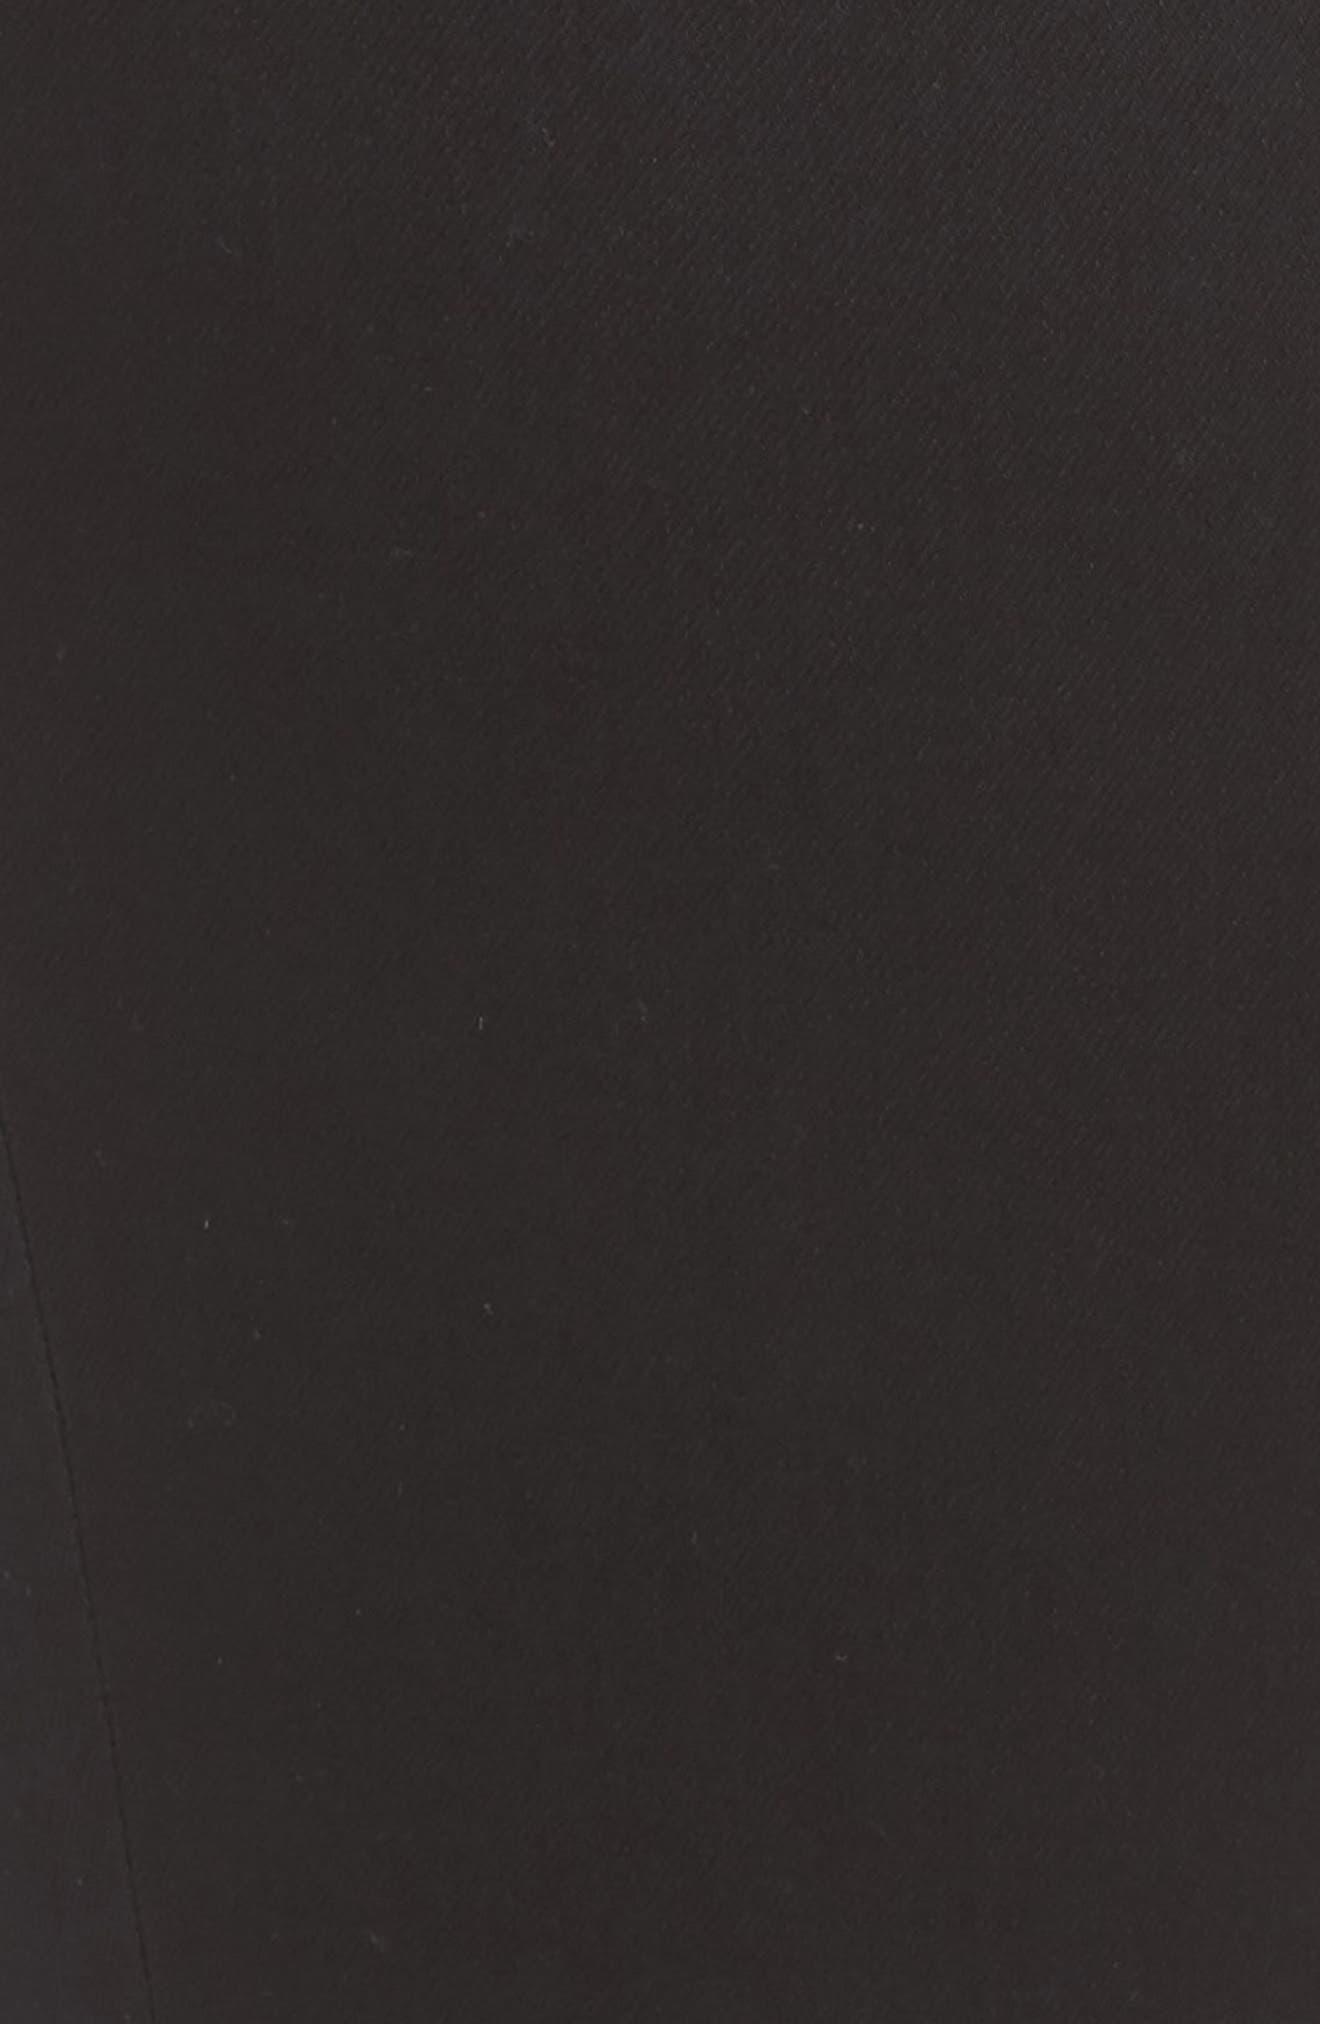 Sadie Stretch Straight Jeans,                             Alternate thumbnail 6, color,                             BLACK RINSE